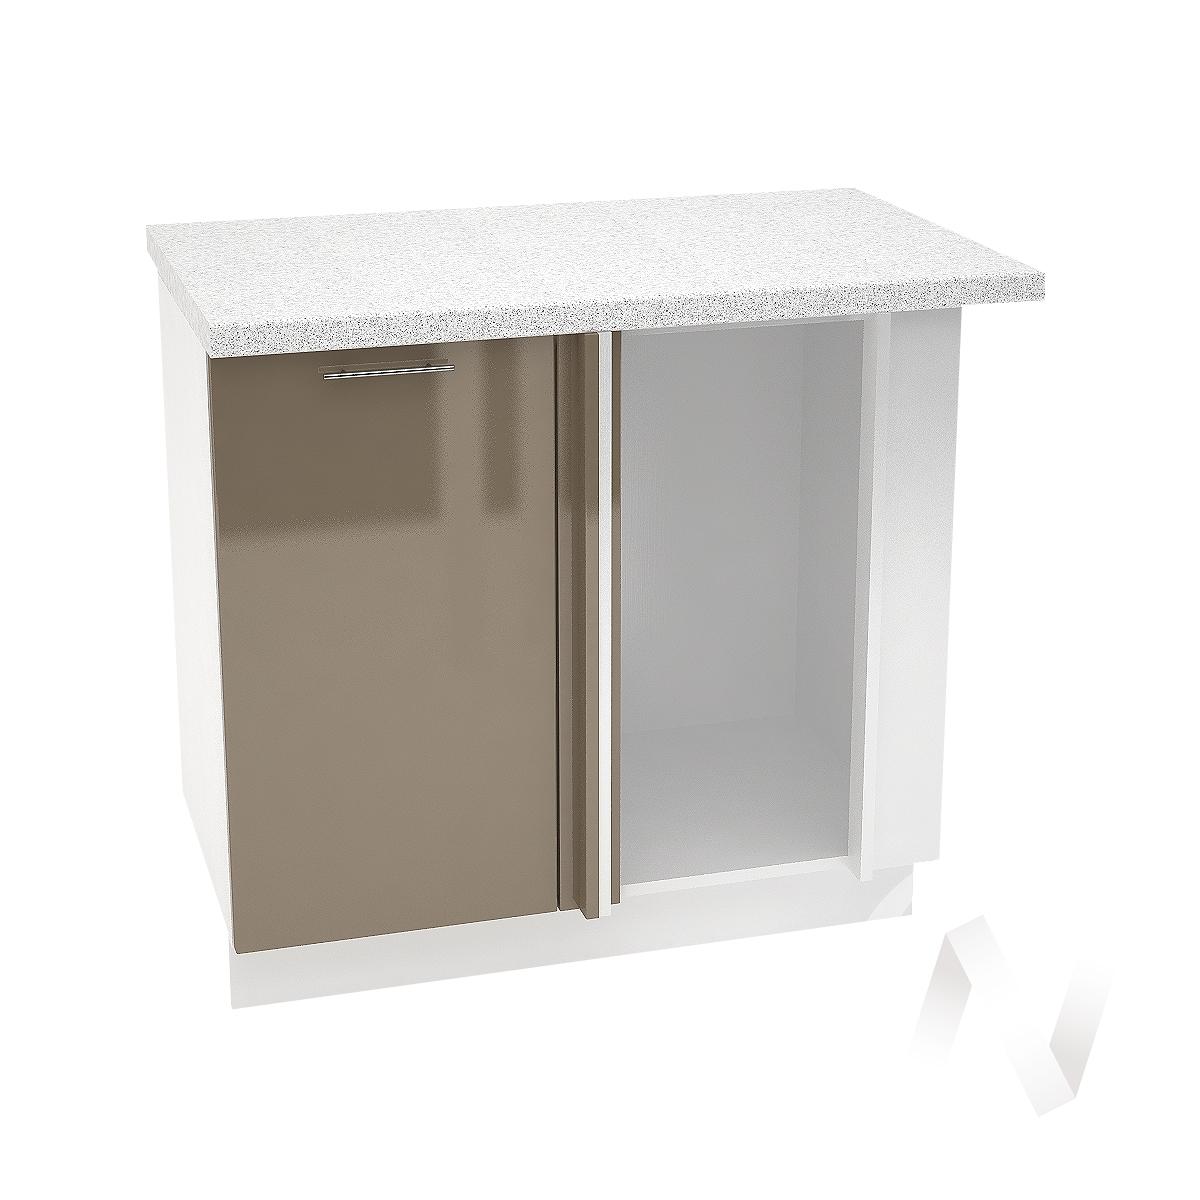 "Кухня ""Валерия-М"": Шкаф нижний угловой 990М, ШНУ 990М (Капучино глянец/корпус белый)"